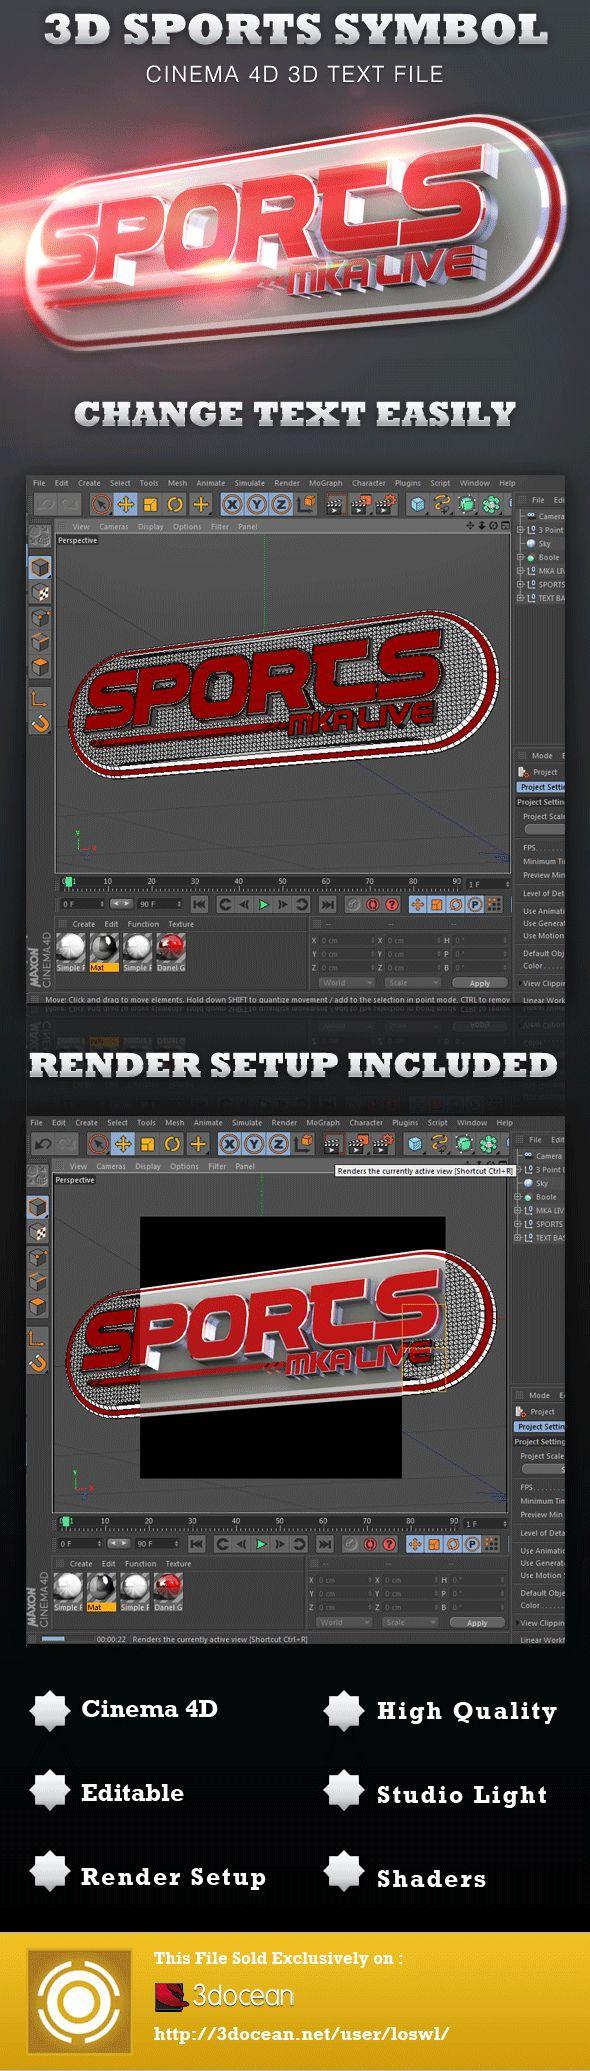 3D Sports Symbol Cinema 4D File